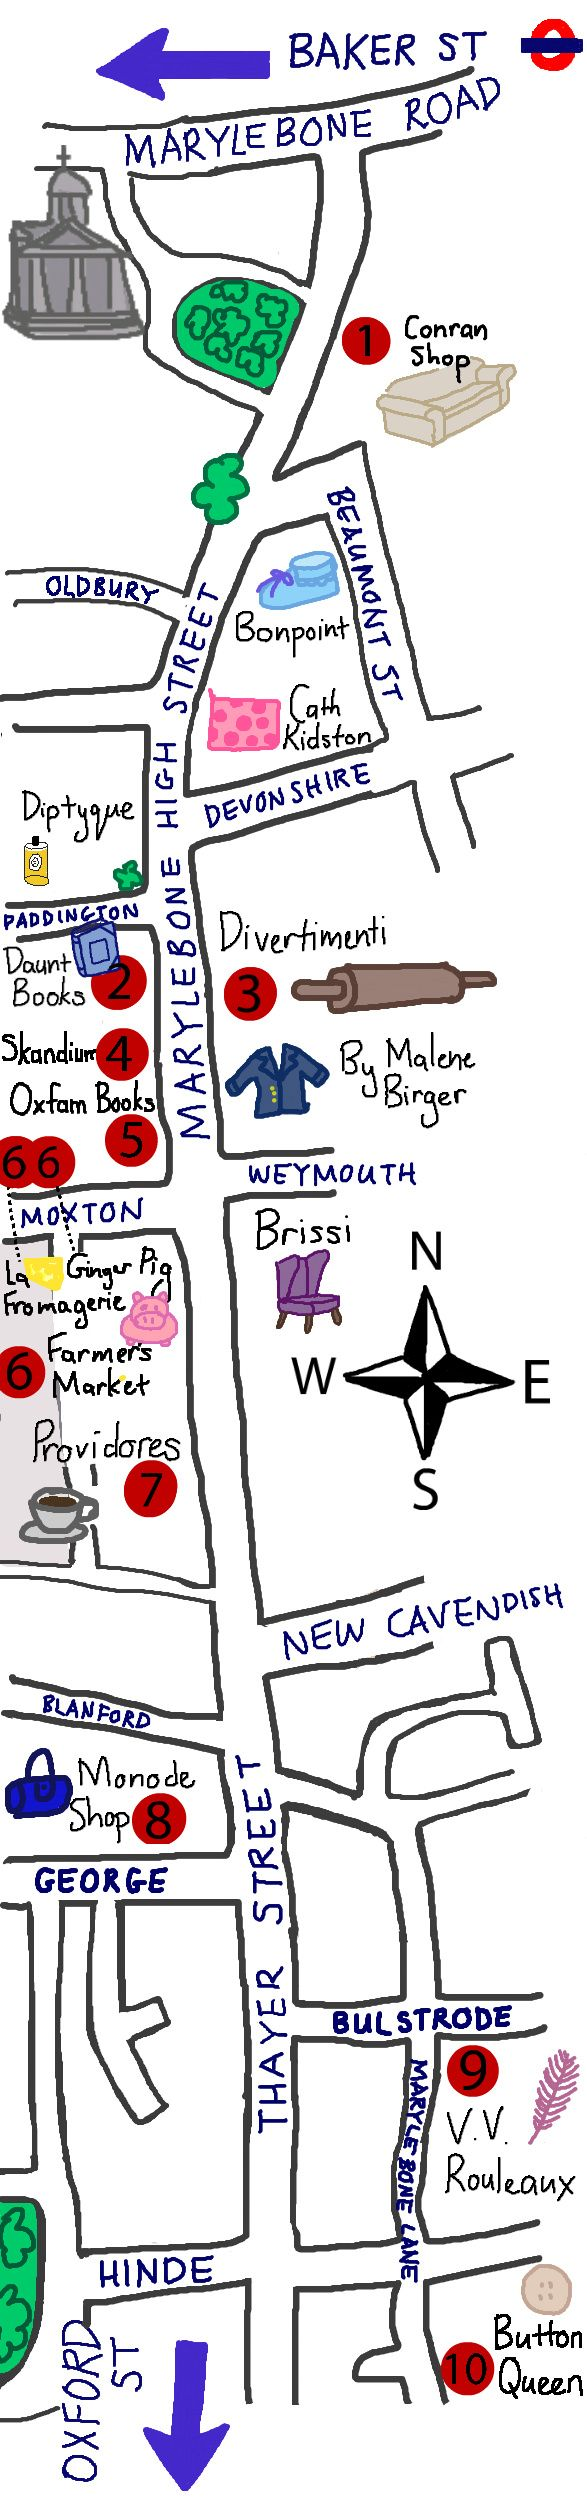 Map of my favorite shops on Marylebone High Street, from Working Girl Press (www.workinggirlpress.com)